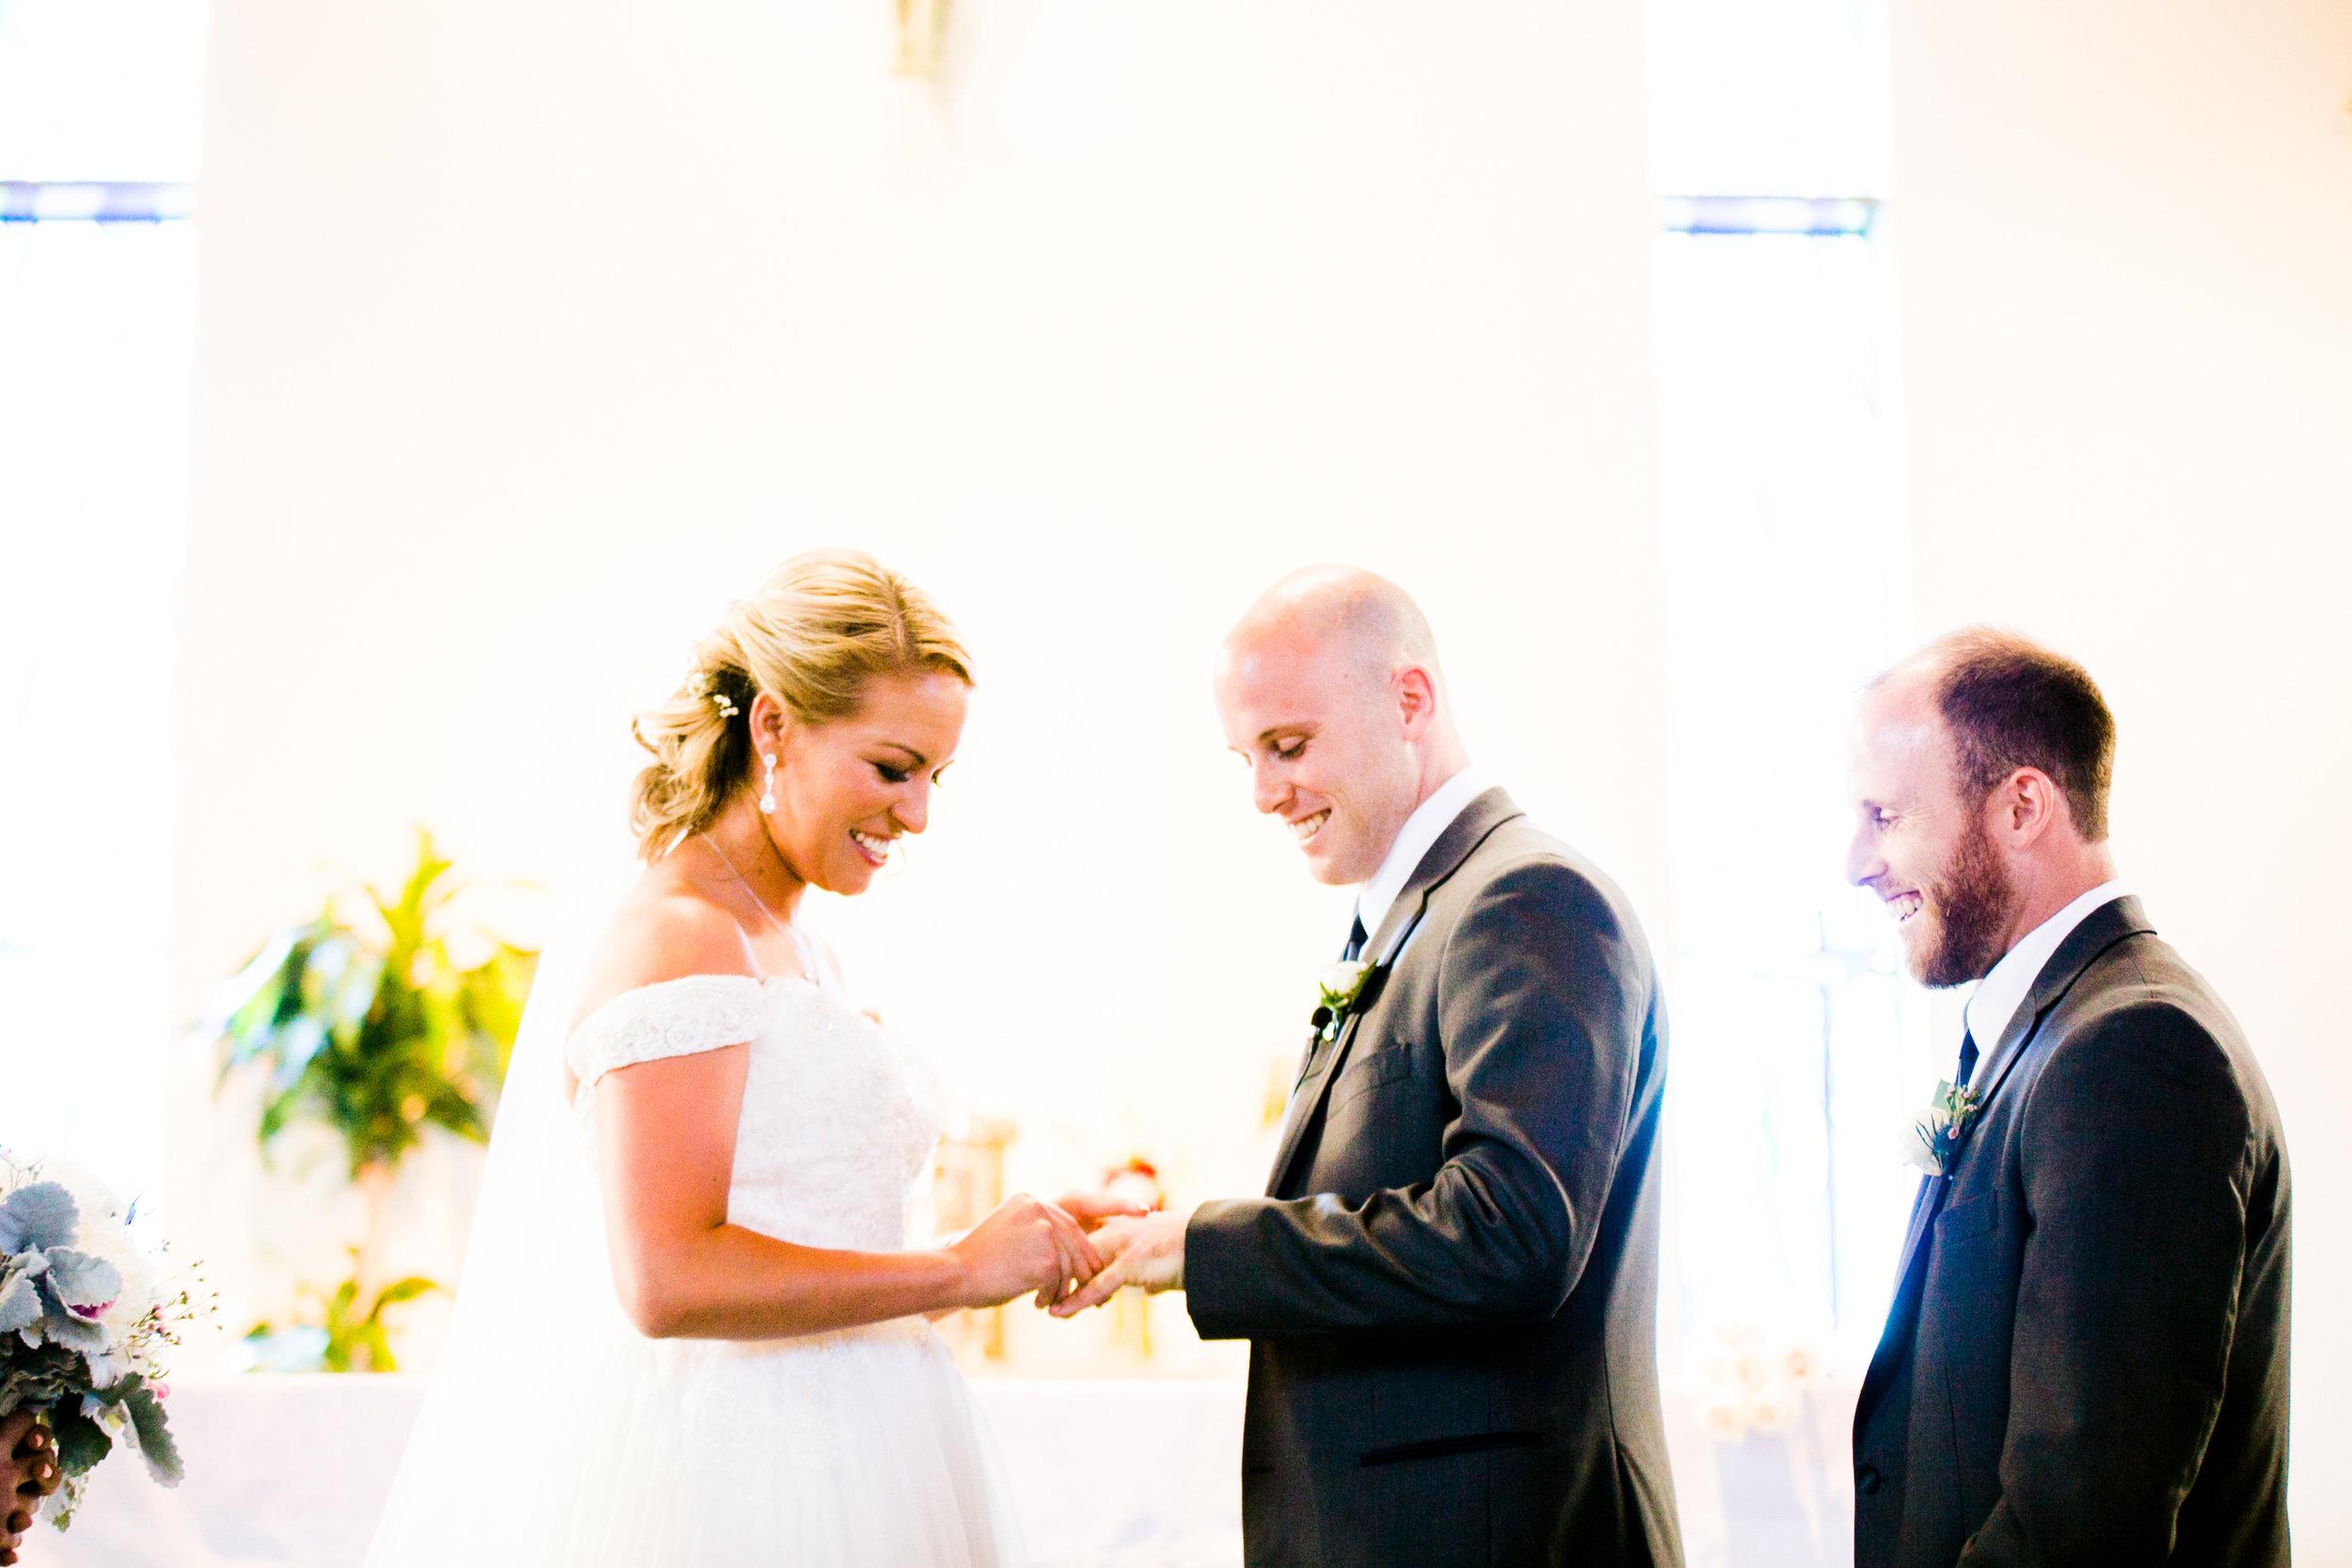 ICONA GOLDEN INN AVALON NJ WEDDING PHOTOGRAPHY  - 049.jpg